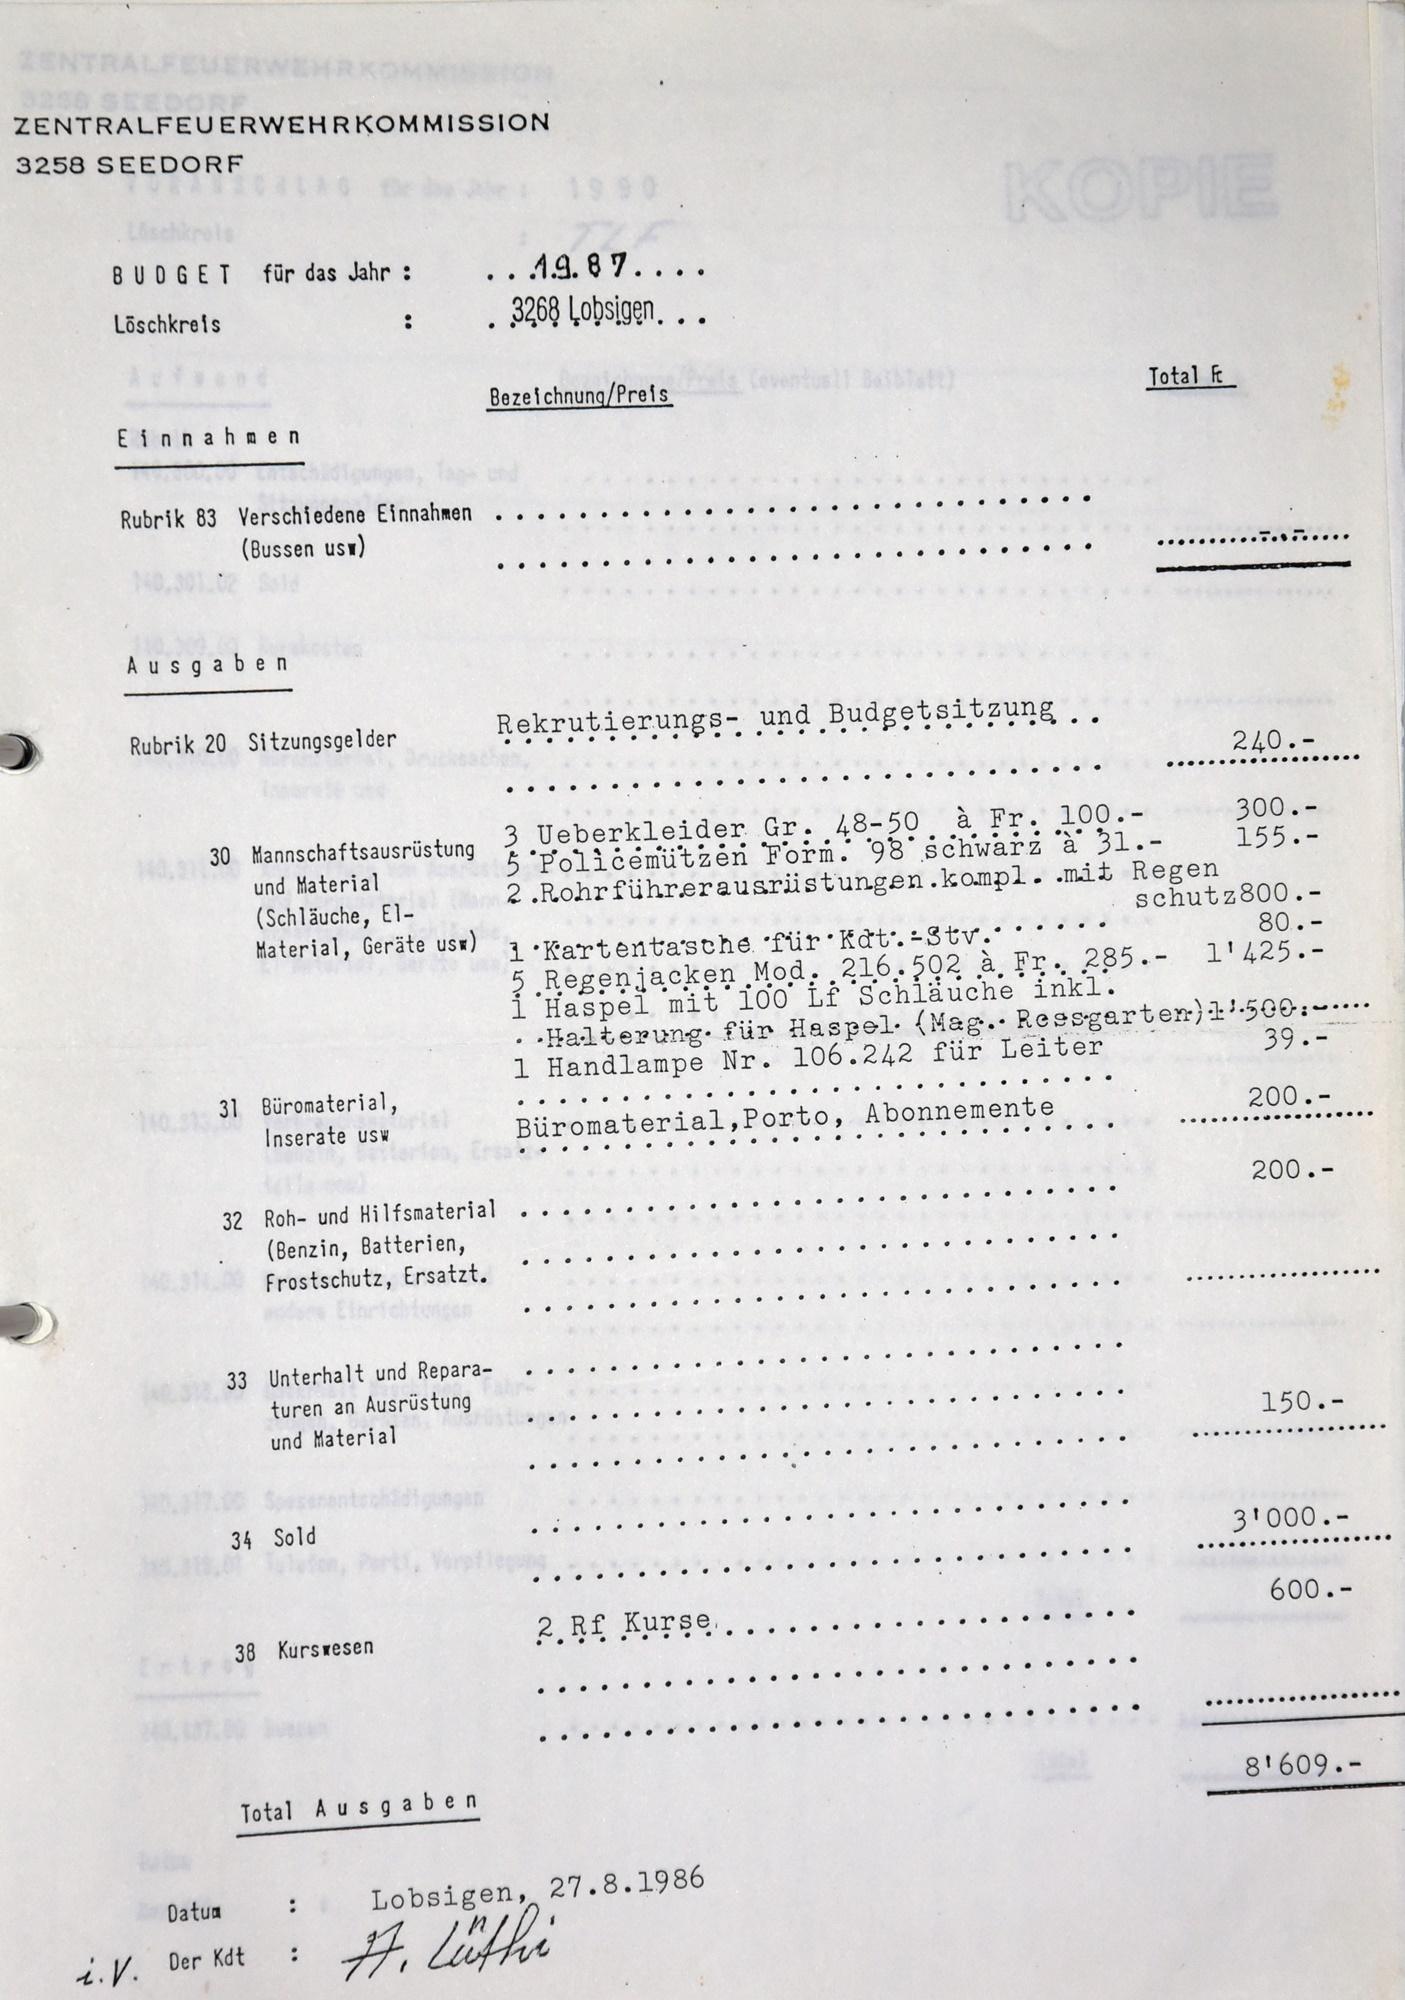 1987 Budget